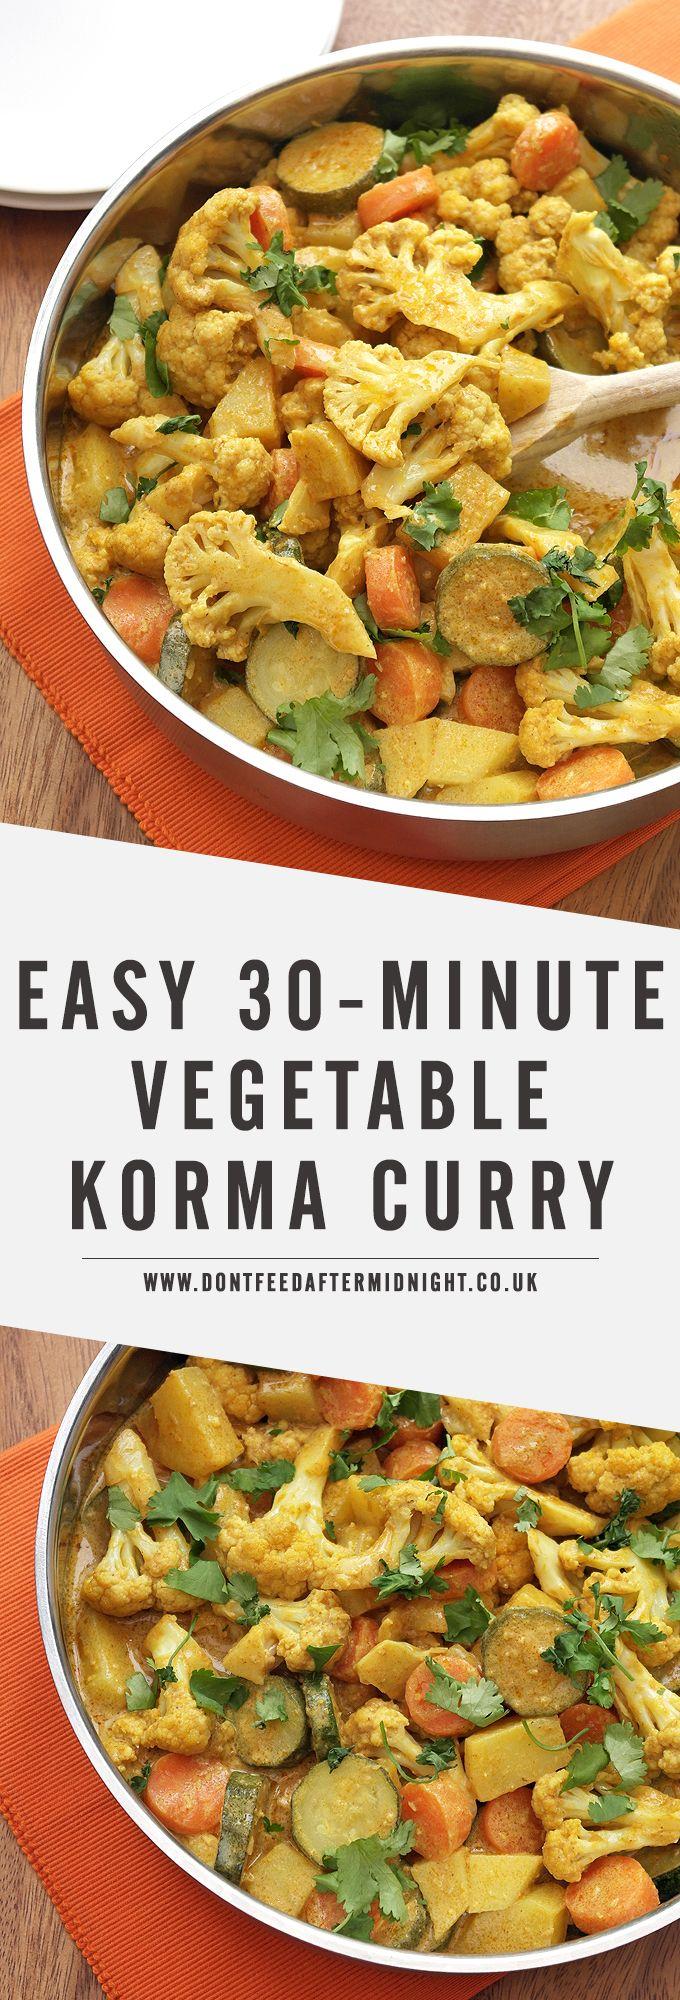 The 25 best vegan food delivery ideas on pinterest savory easy 30 minute vegetable korma forumfinder Gallery